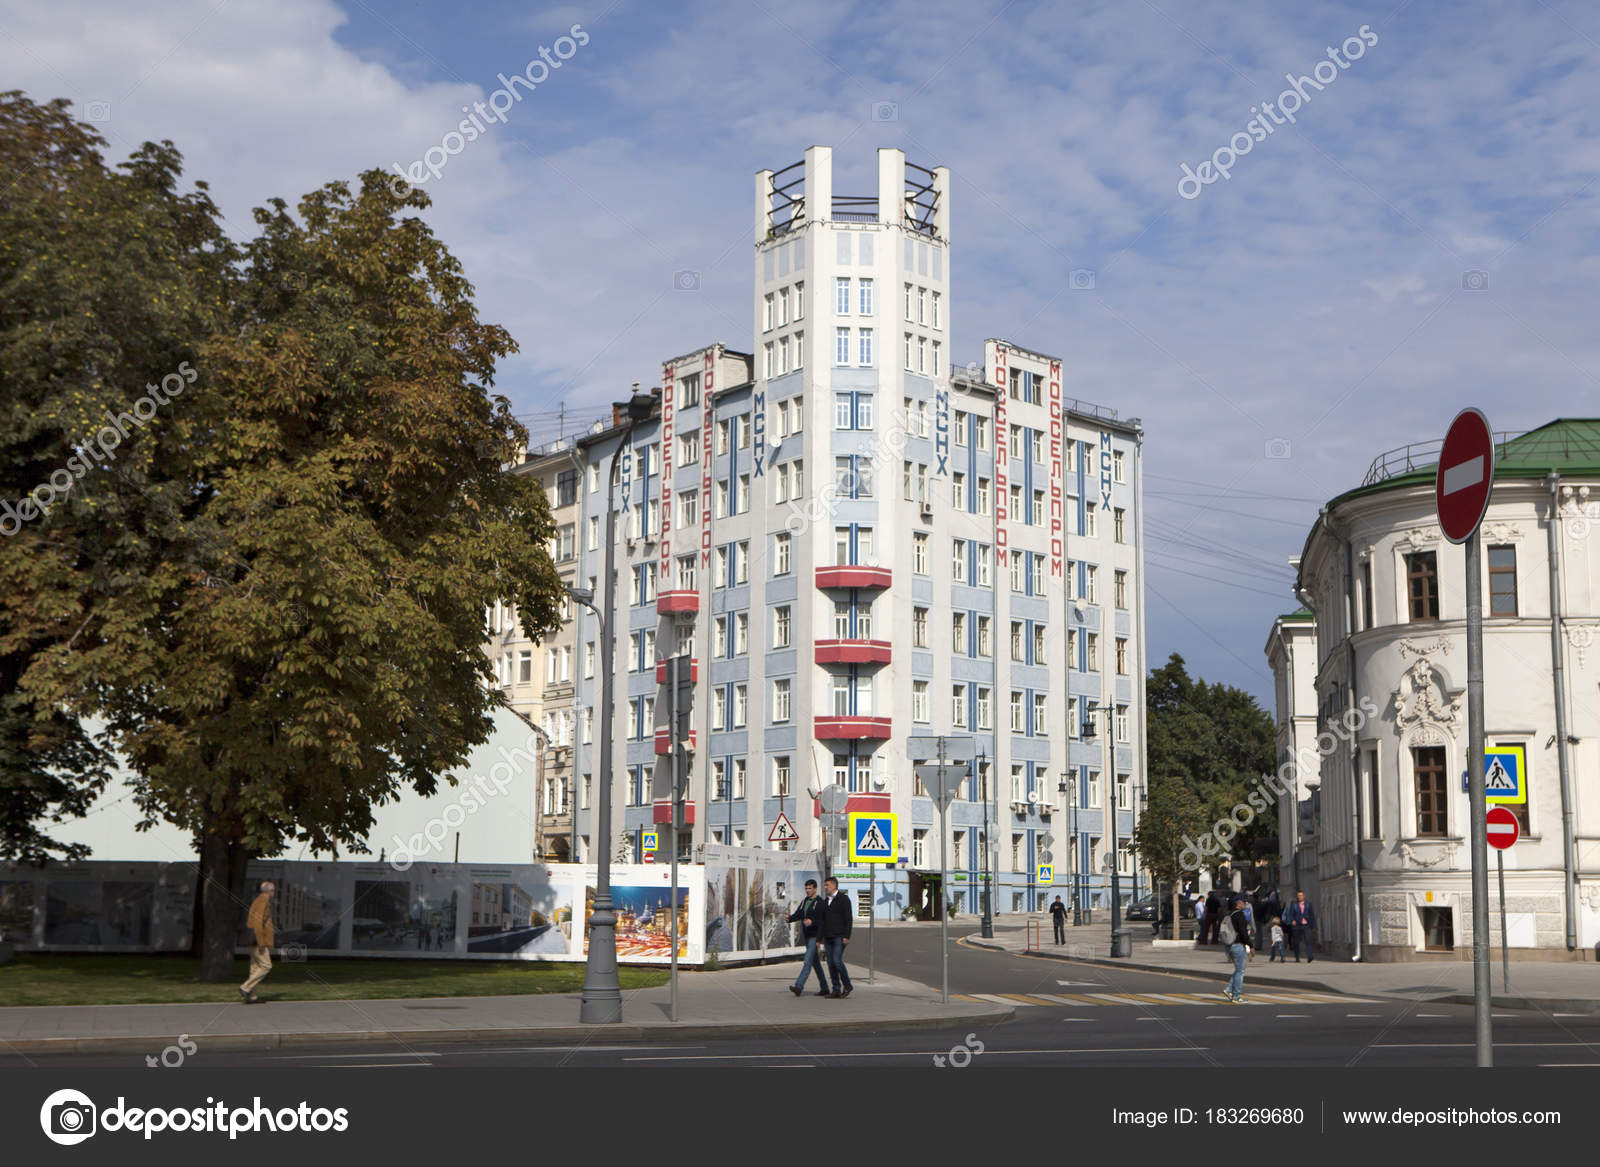 Konstruktivismus Architektur: памятник русской архитектуры